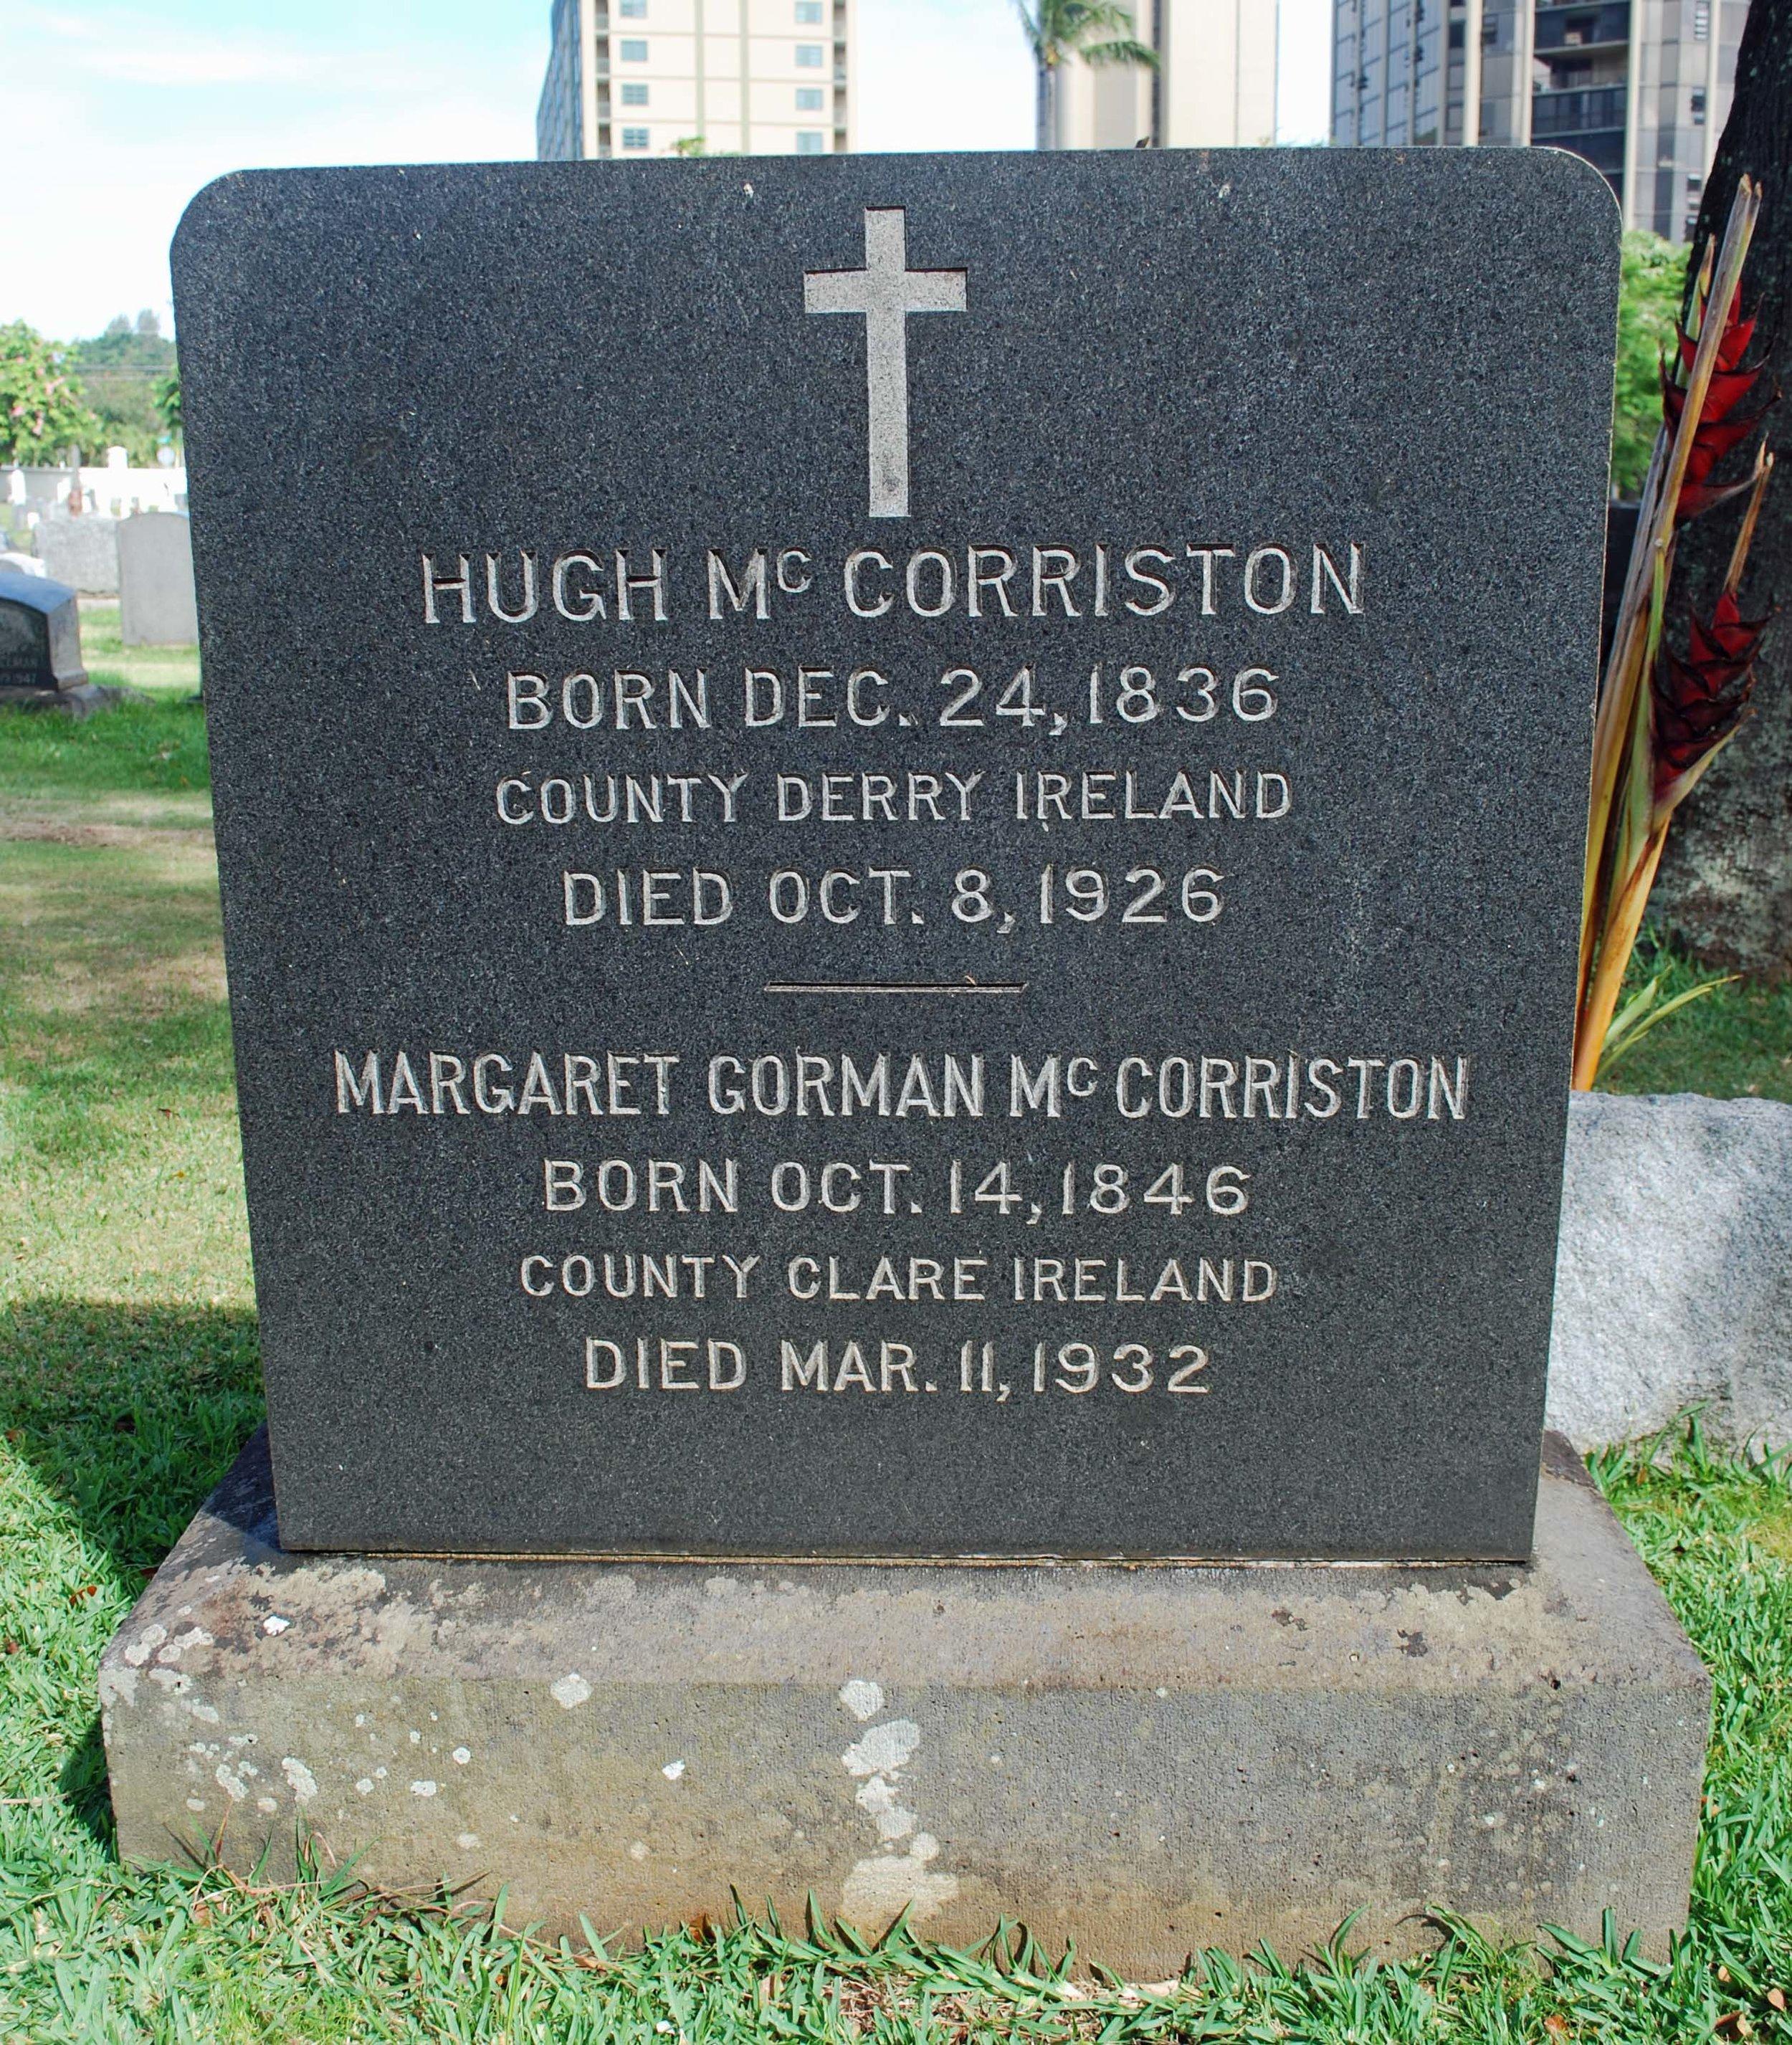 Headstone of Margaret Gorman McCorriston, 1932